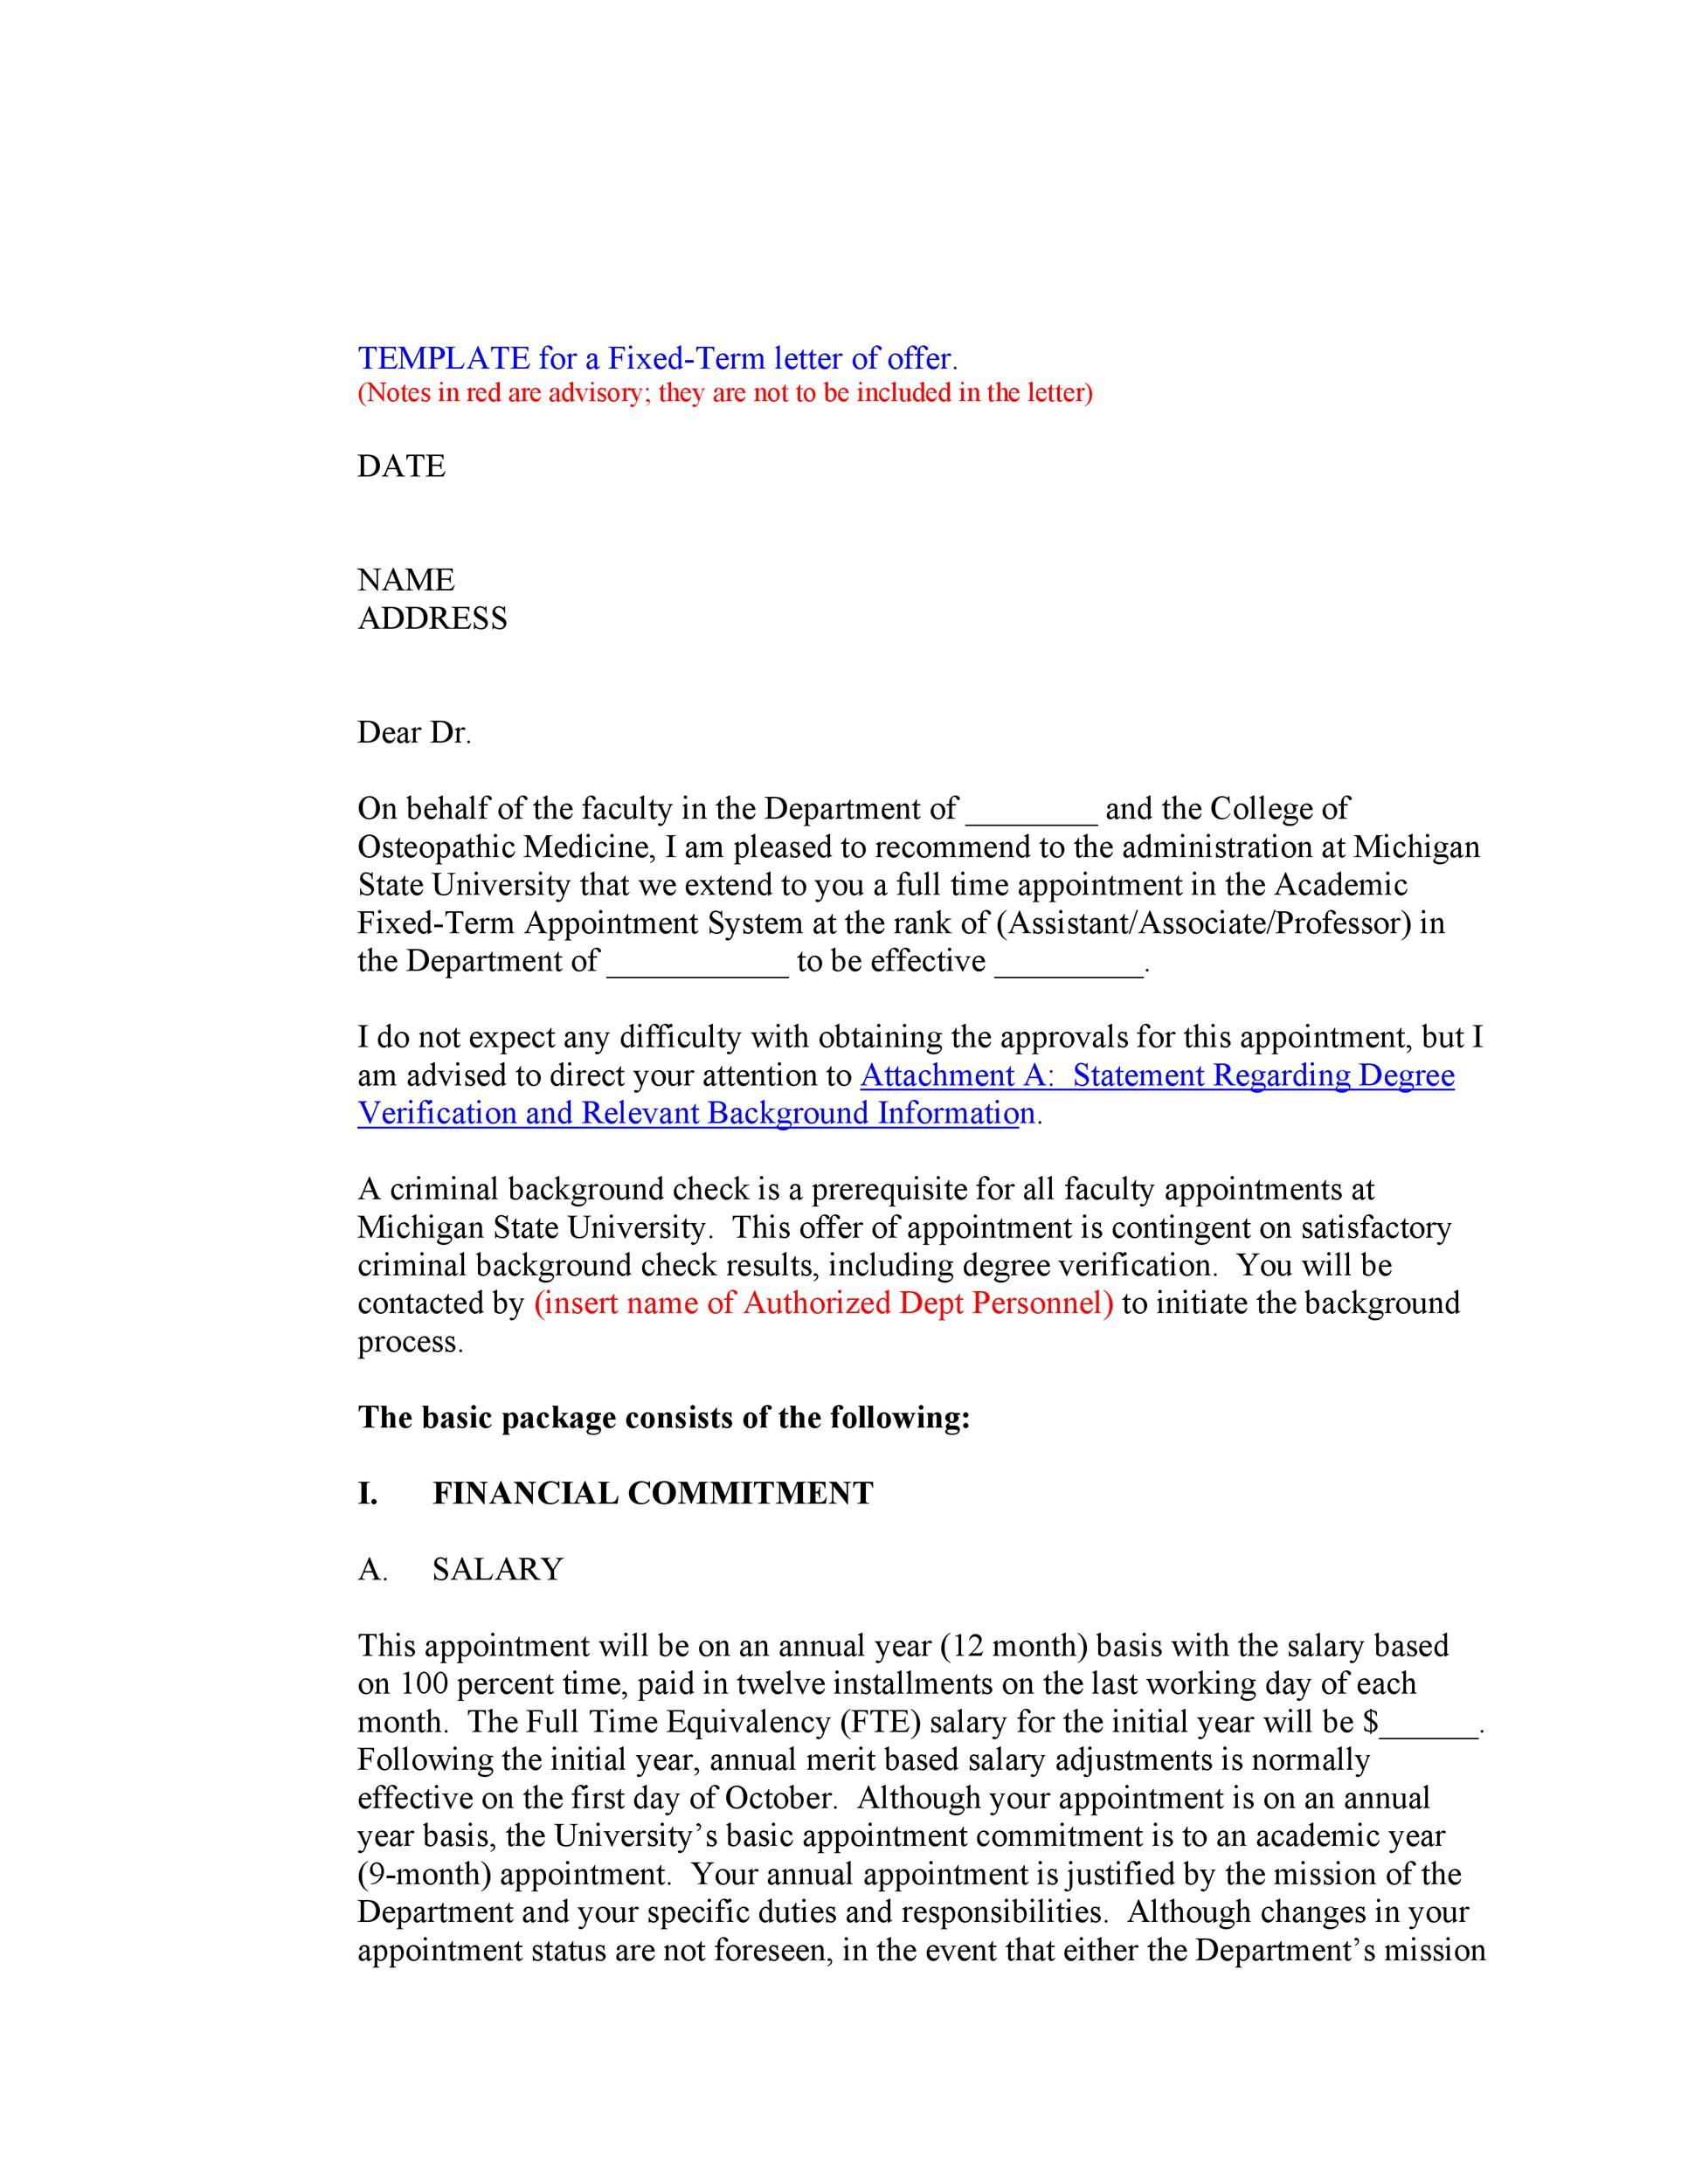 Free Offer letter 44